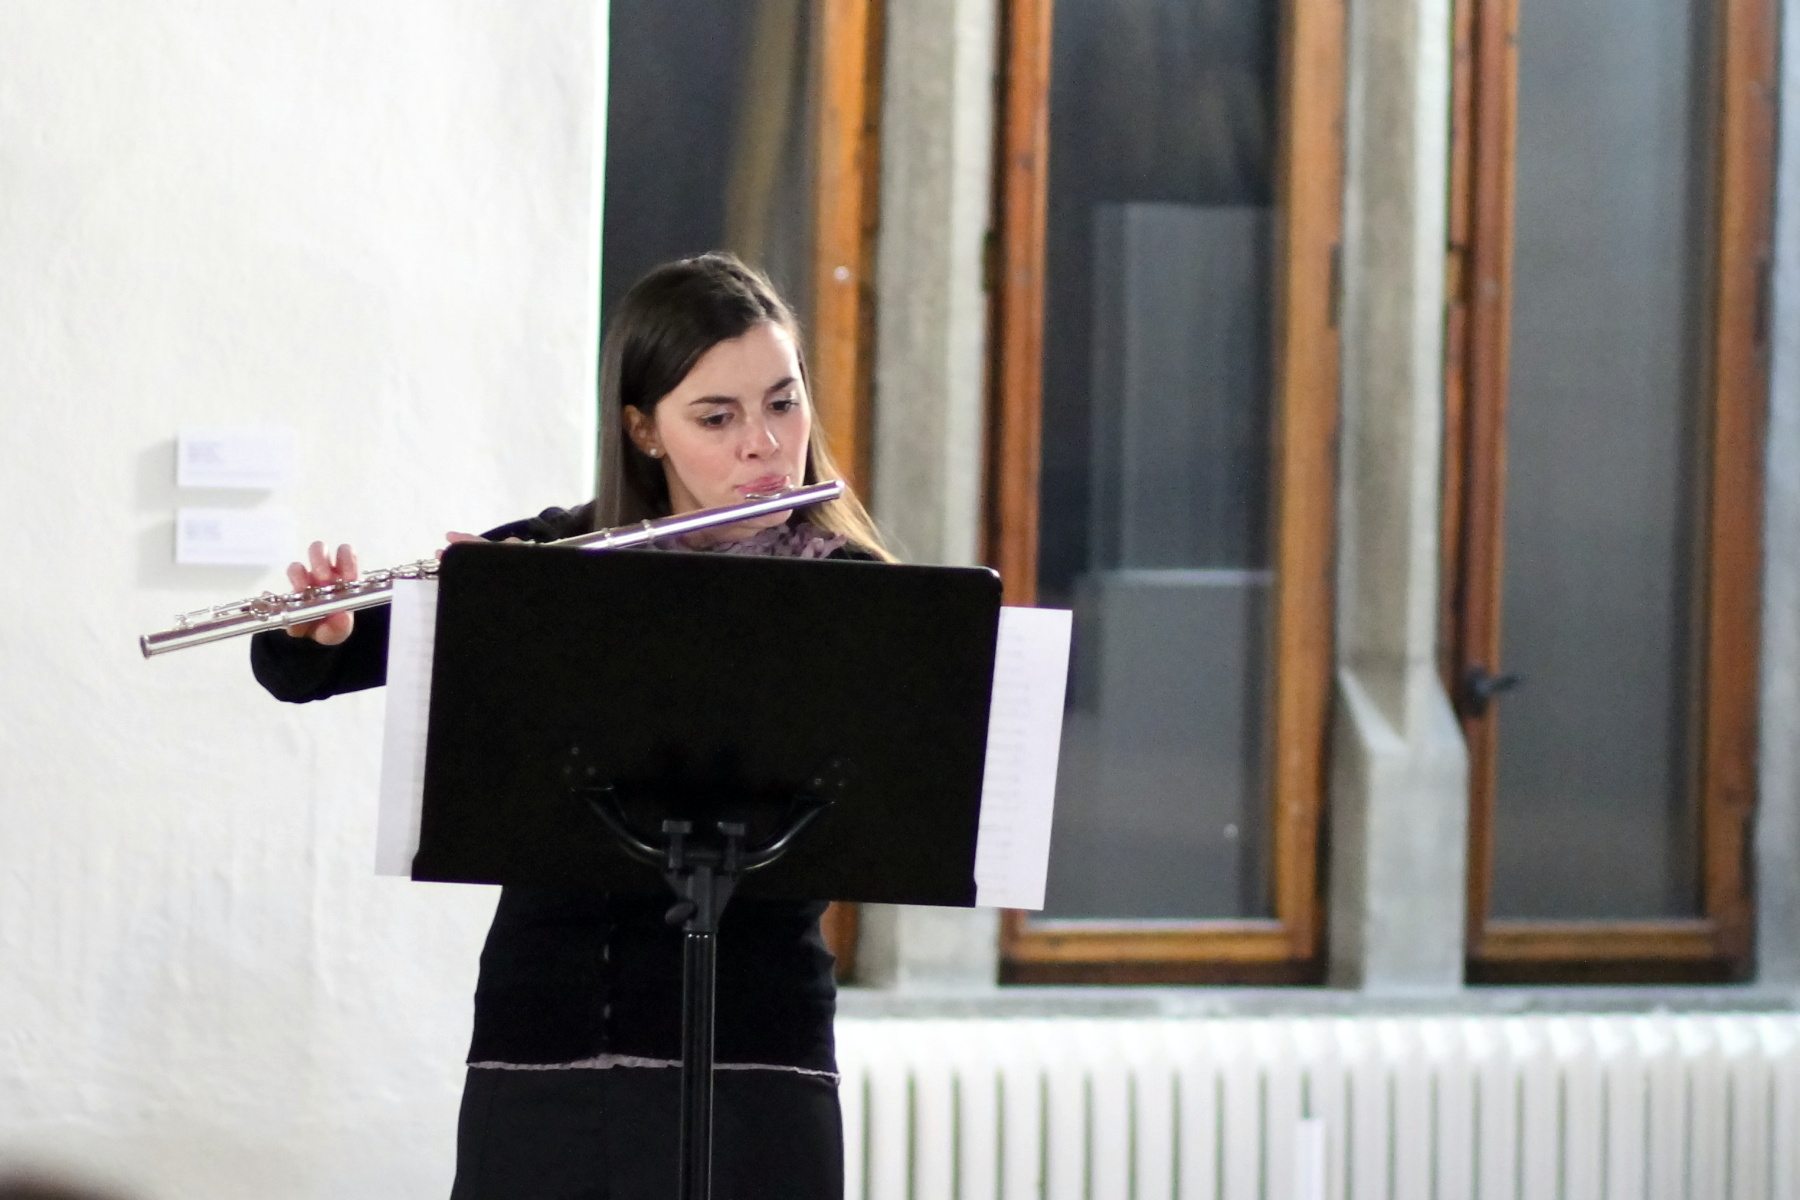 velikani-hudby-zvolensky-zamok-8